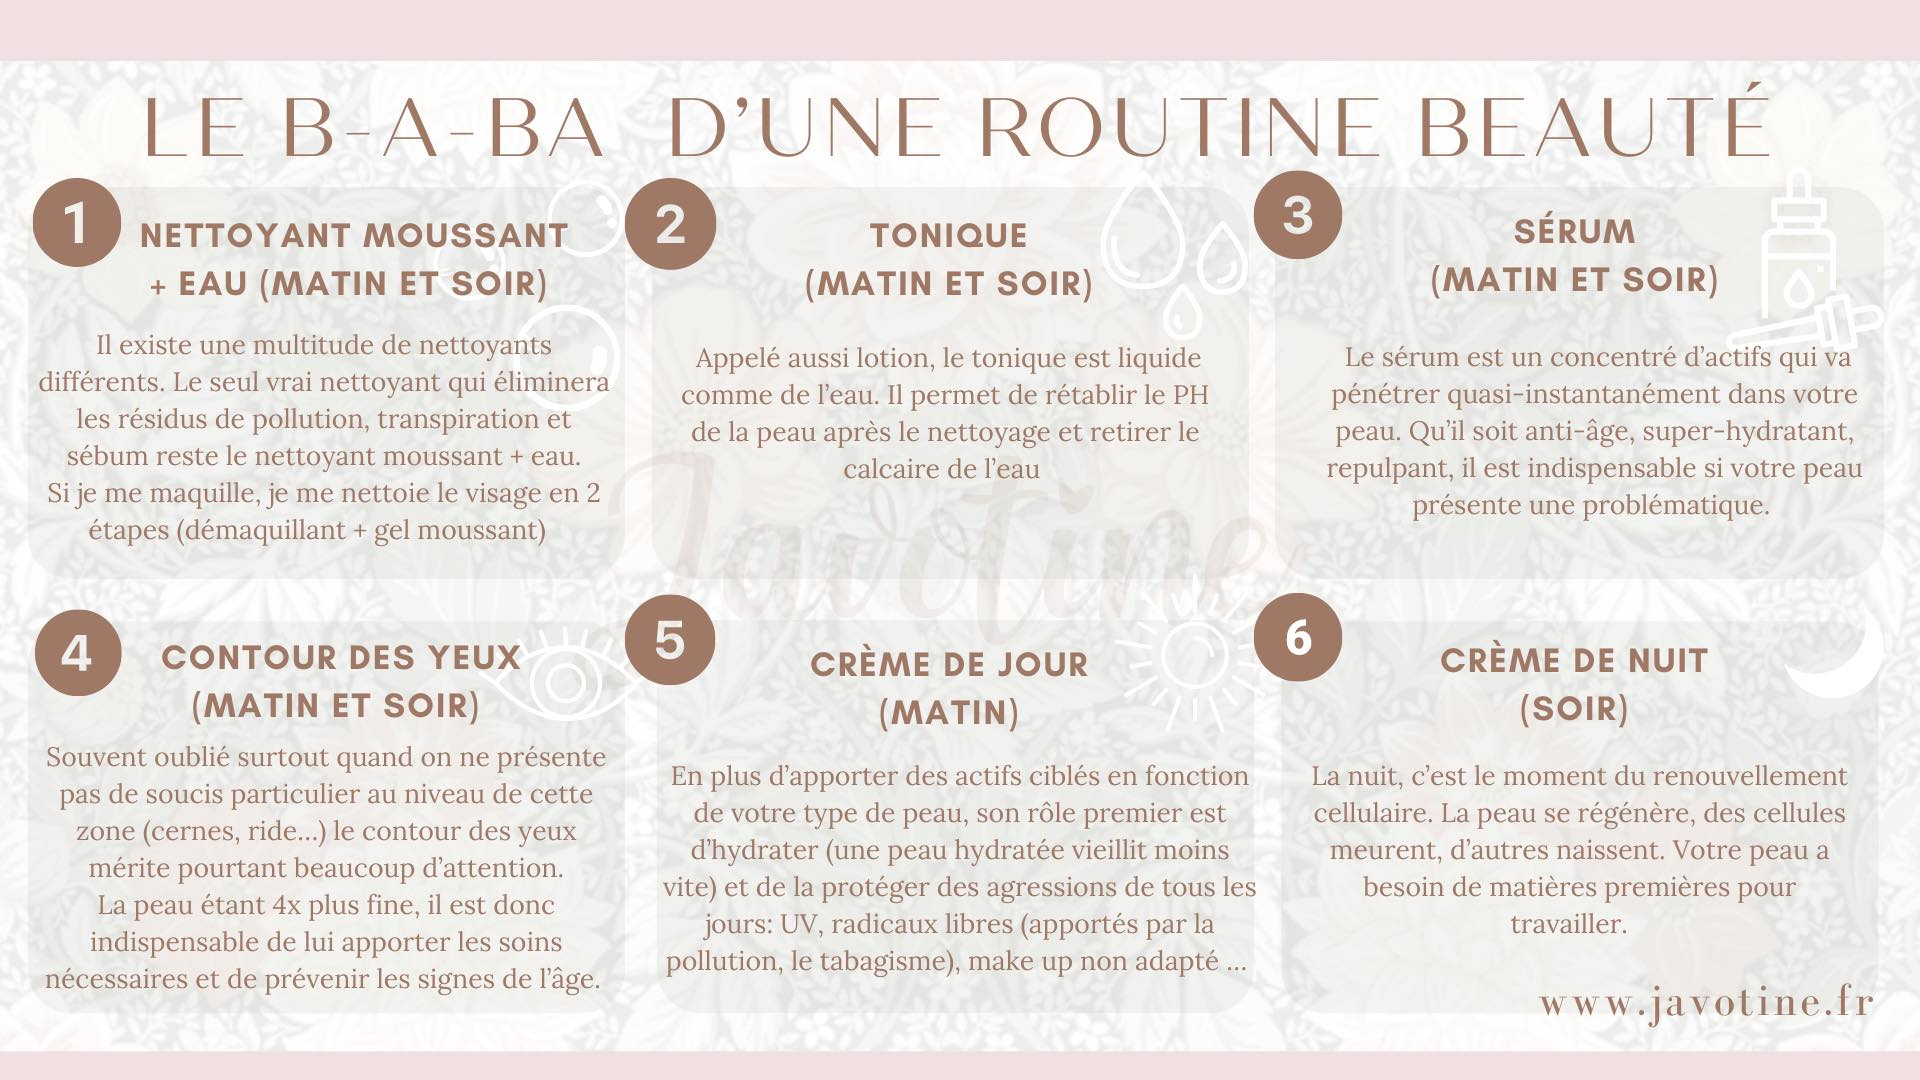 ba-ba_routine_beaute_javotine.jpg